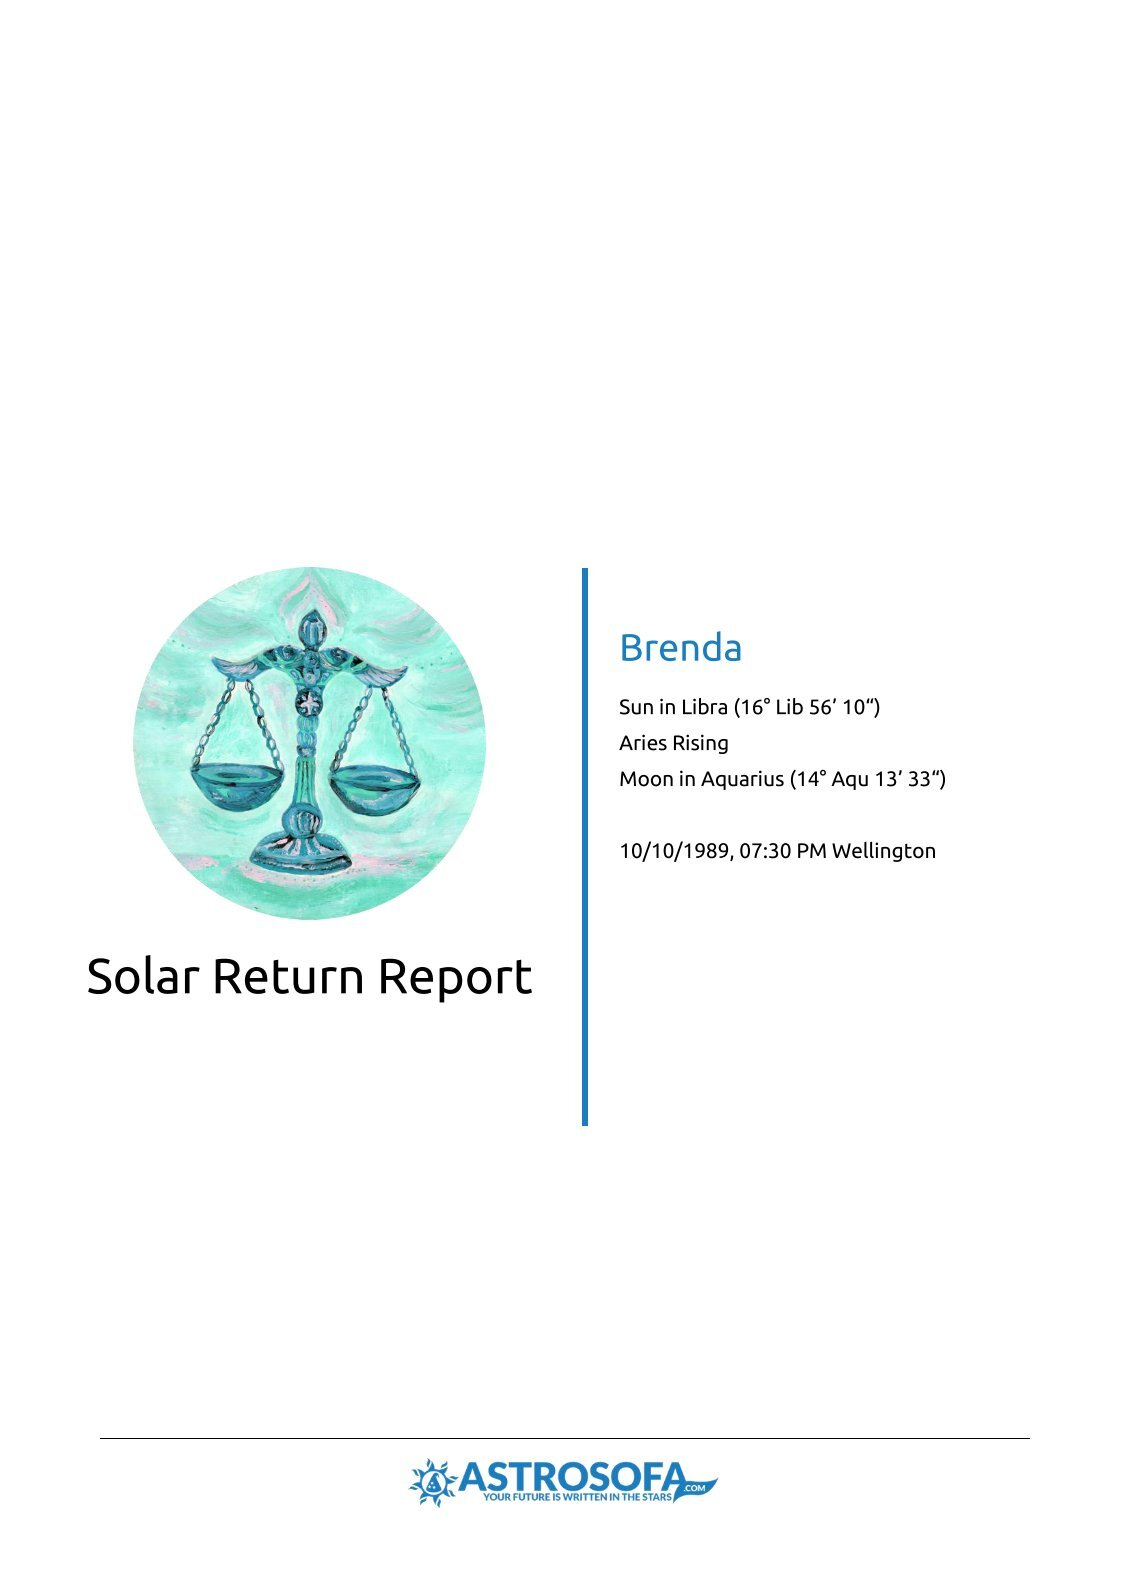 Solar Return Brenda